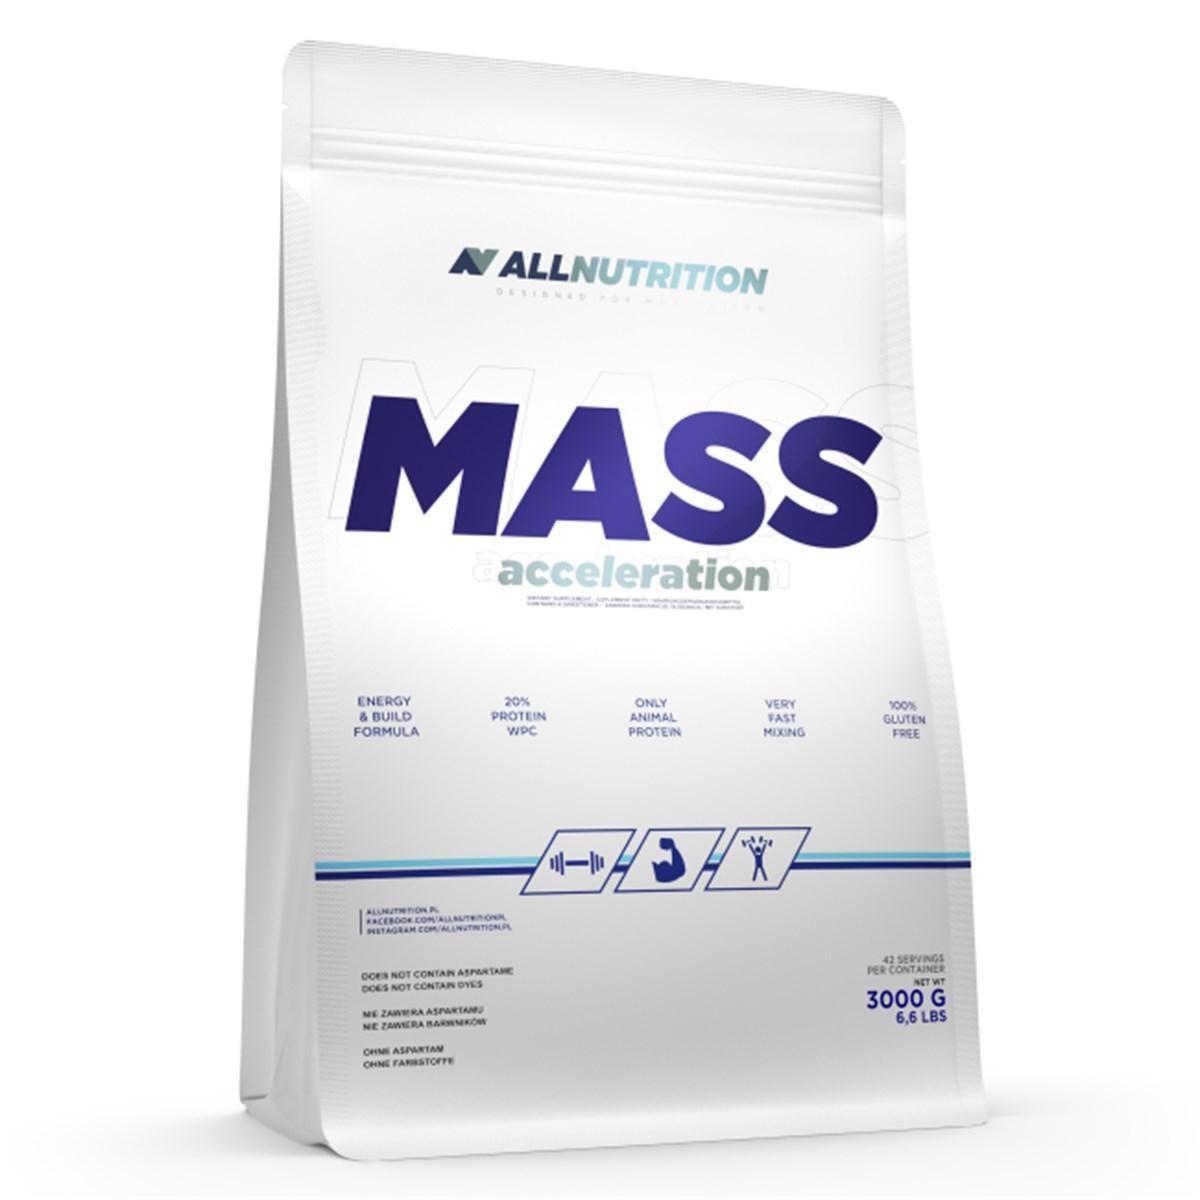 Гейнер для набора массы AllNutrition Mass Acceleration (3 кг) алл нутришн cappuccino